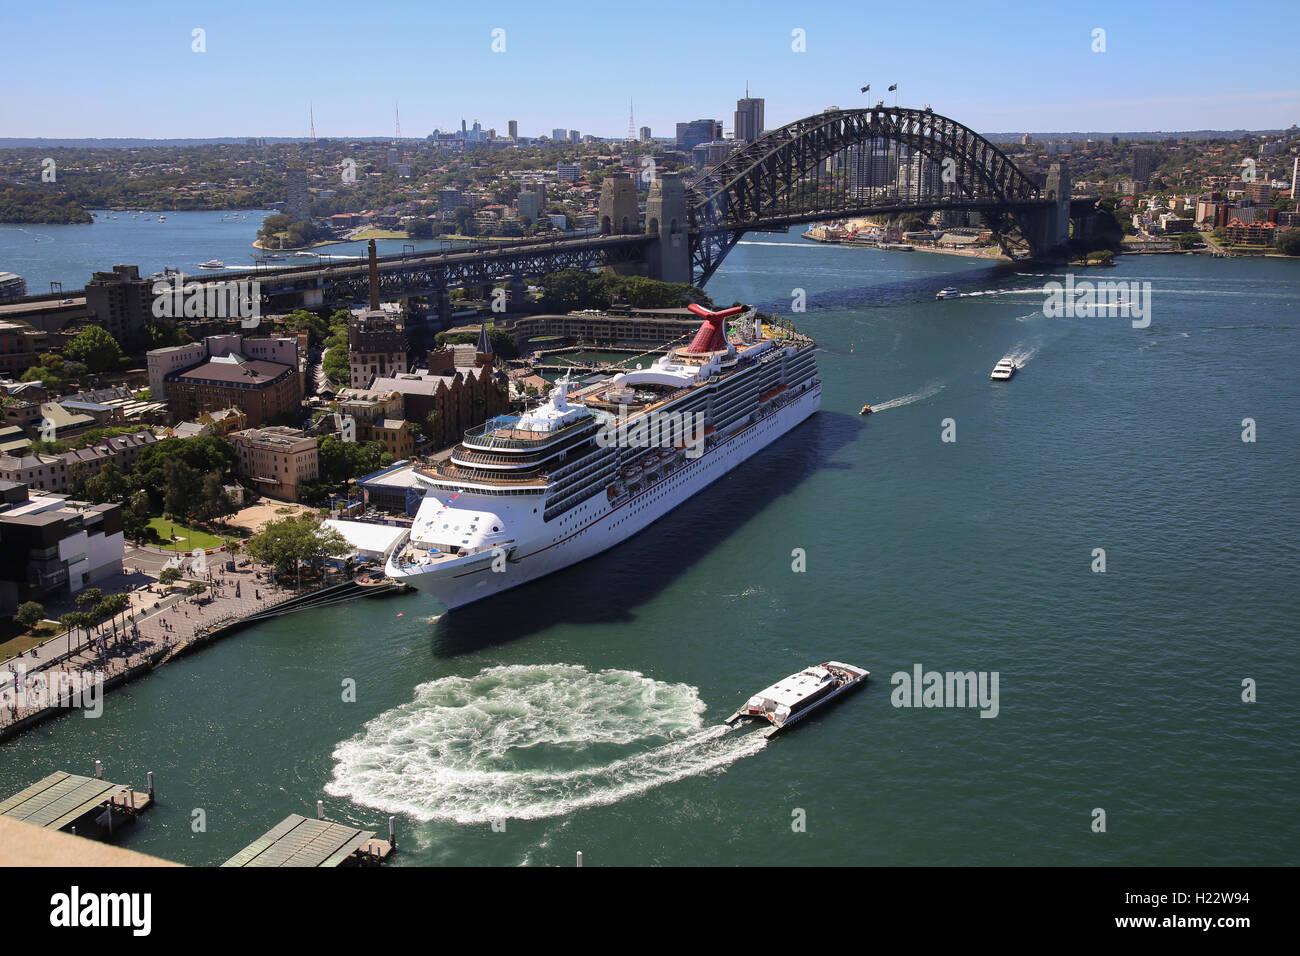 Luxury cruise ship the Carnival Spirit berthed at the Overseas Passenger Terminal Circular Quay Sydney Australia - Stock Image